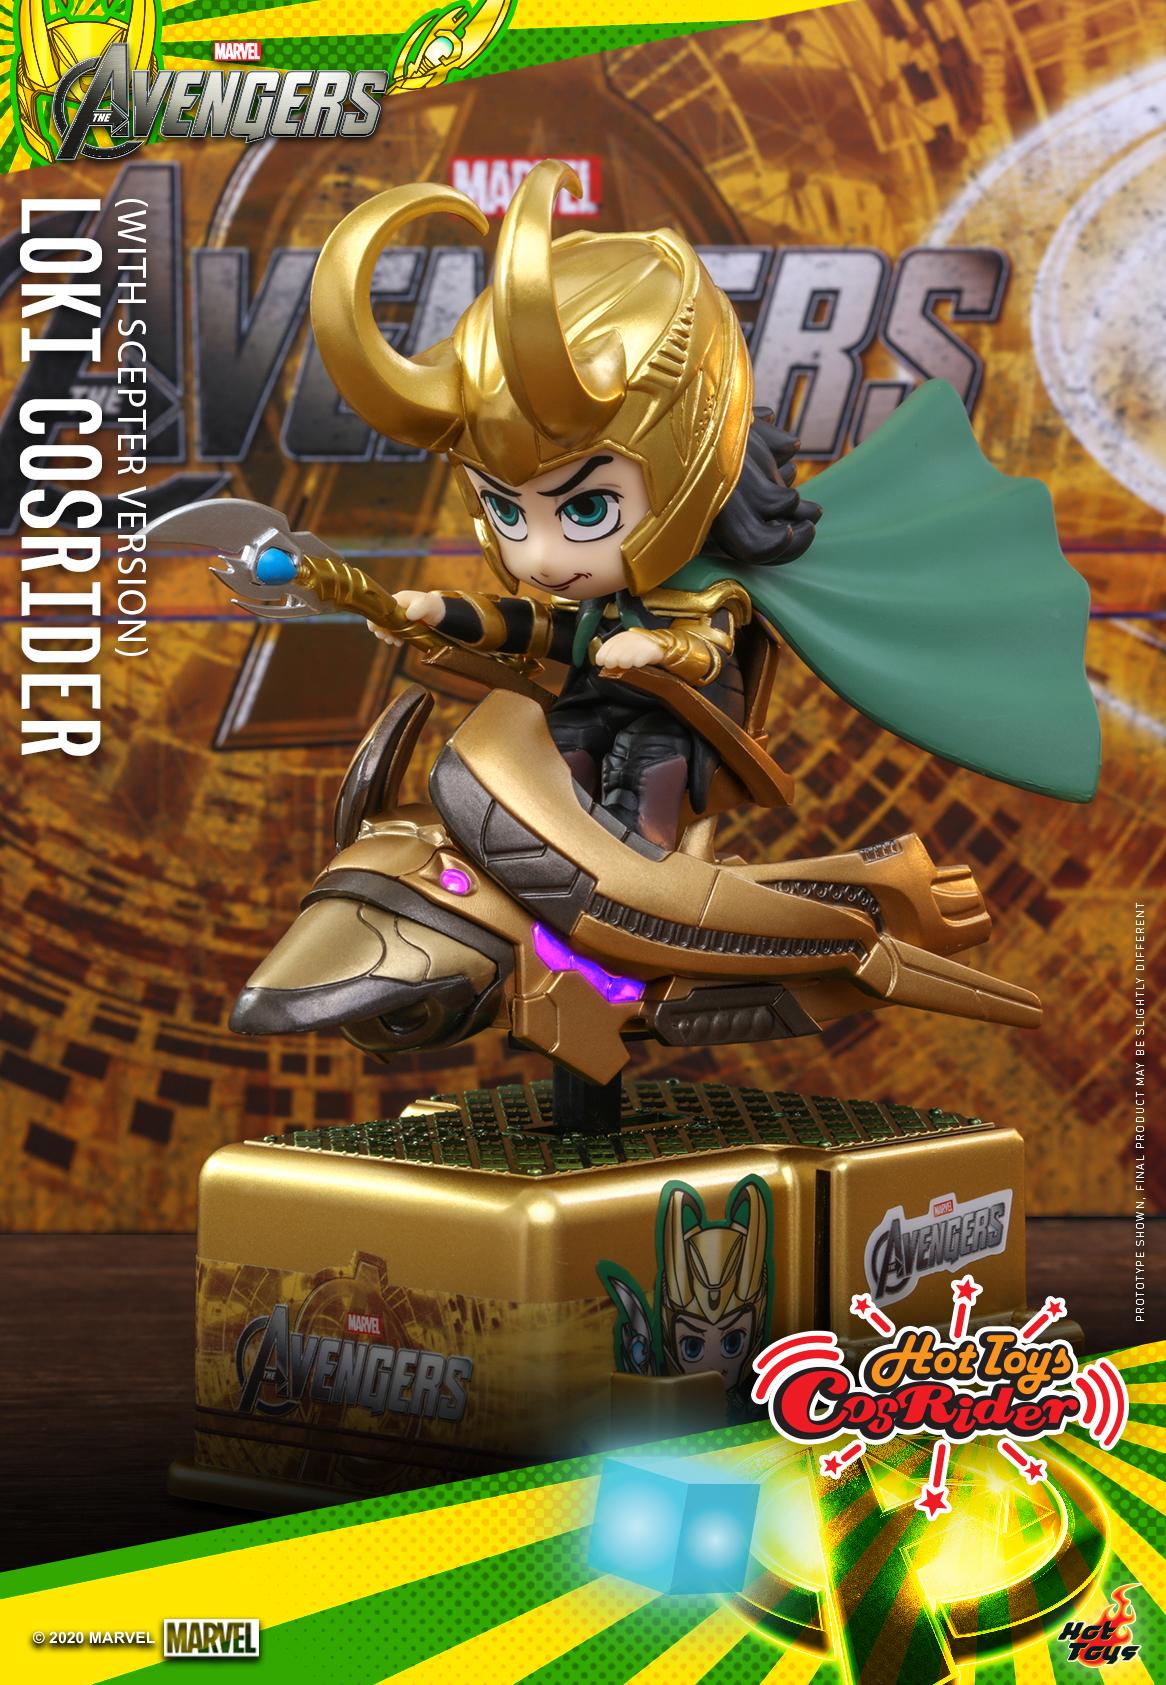 Hot Toys - A1 - Loki (With Scepter) CosRider_PR1